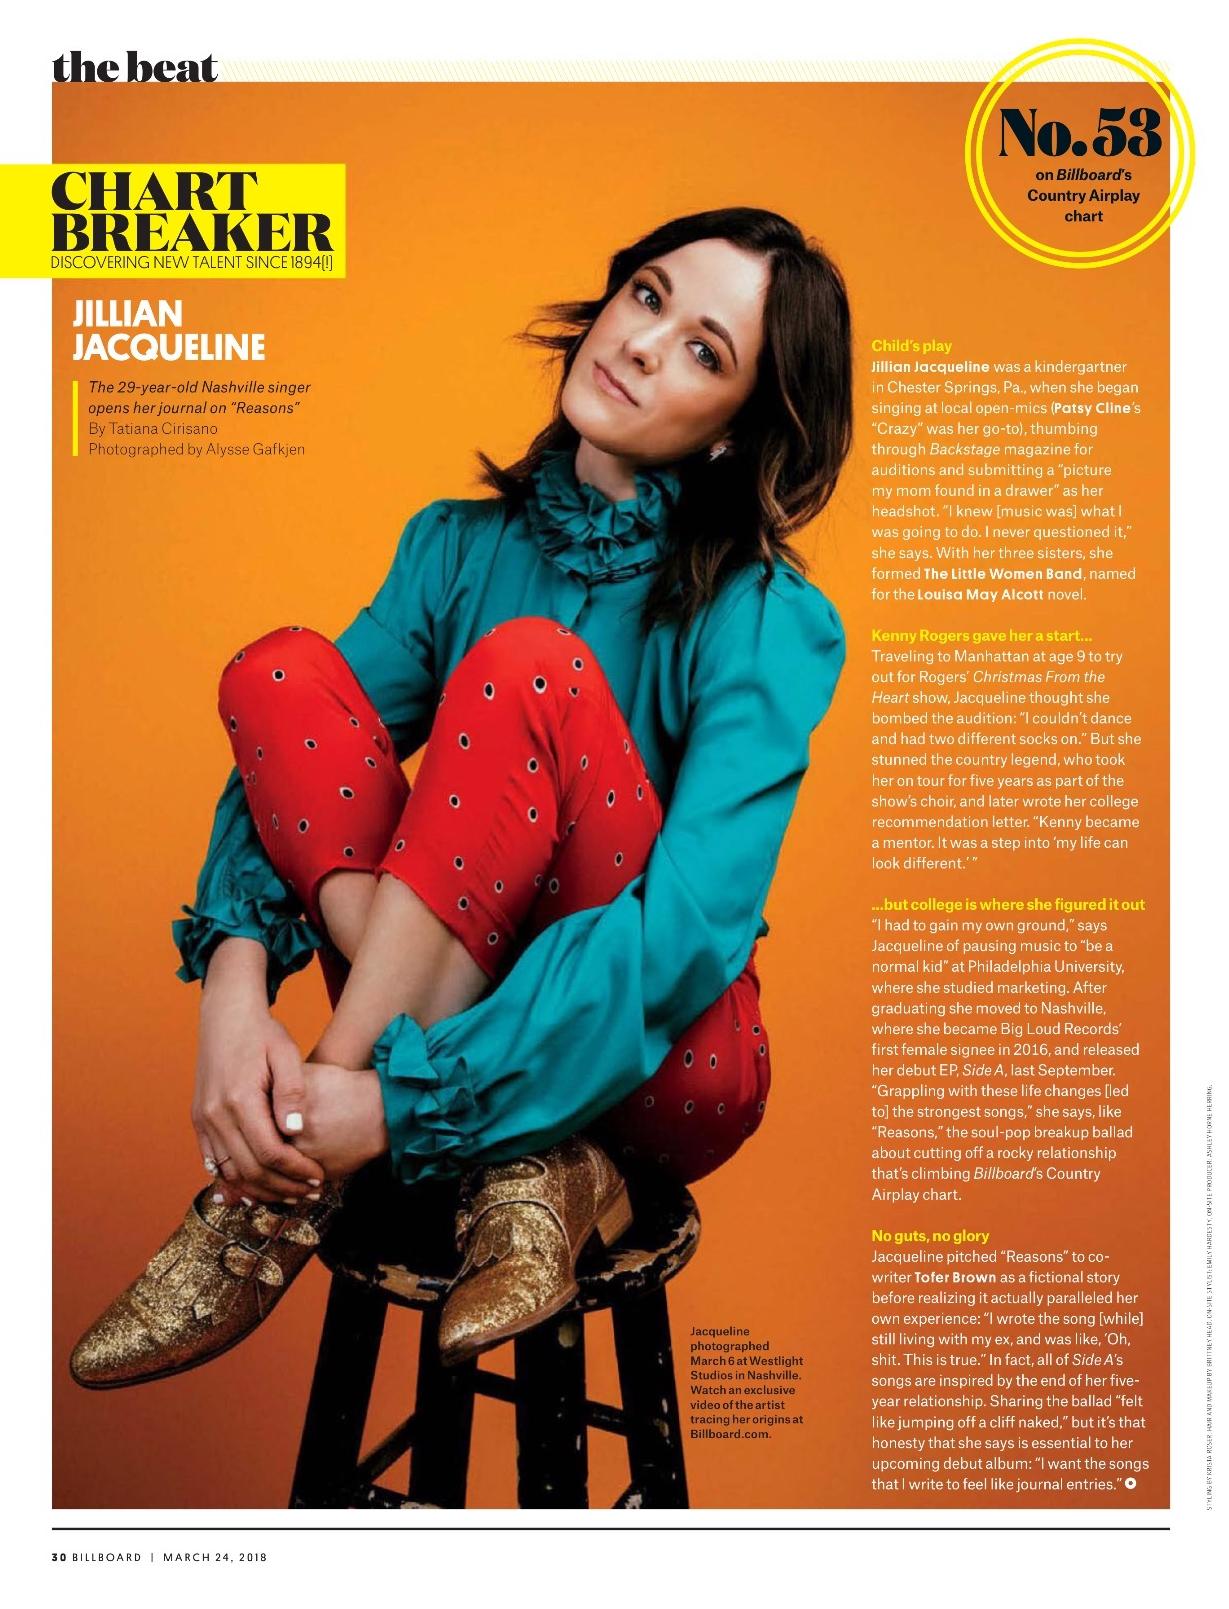 Jillian Billboard March 24th 2017.jpg